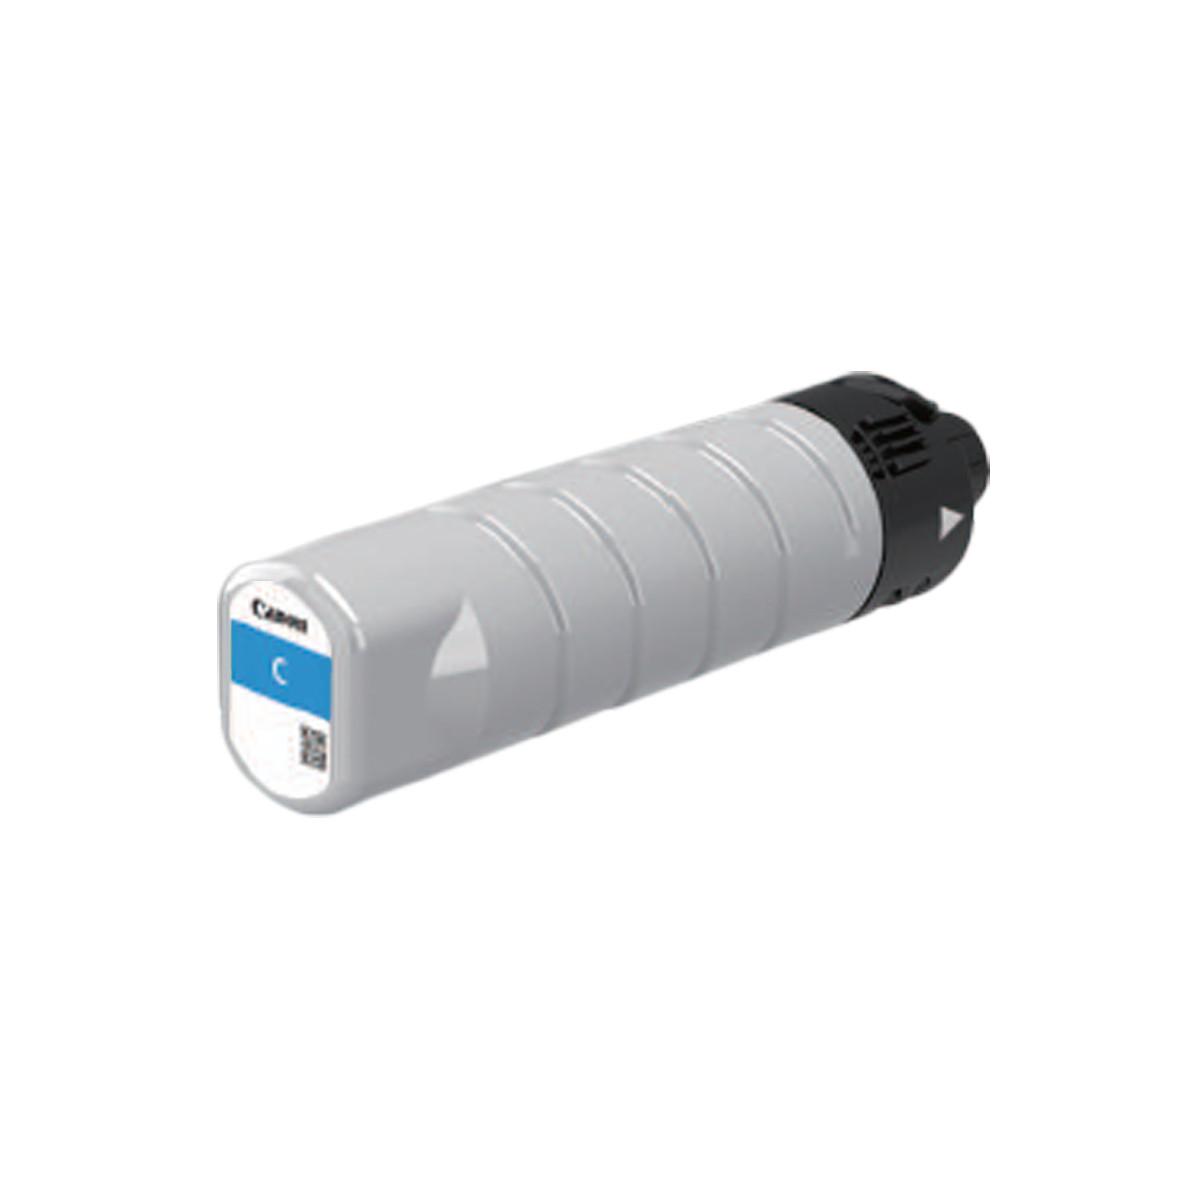 Cartucho de Tinta Canon PGI 7100XXL Ciano | WG7140 7140 WG-7140 WG 7140 | Original